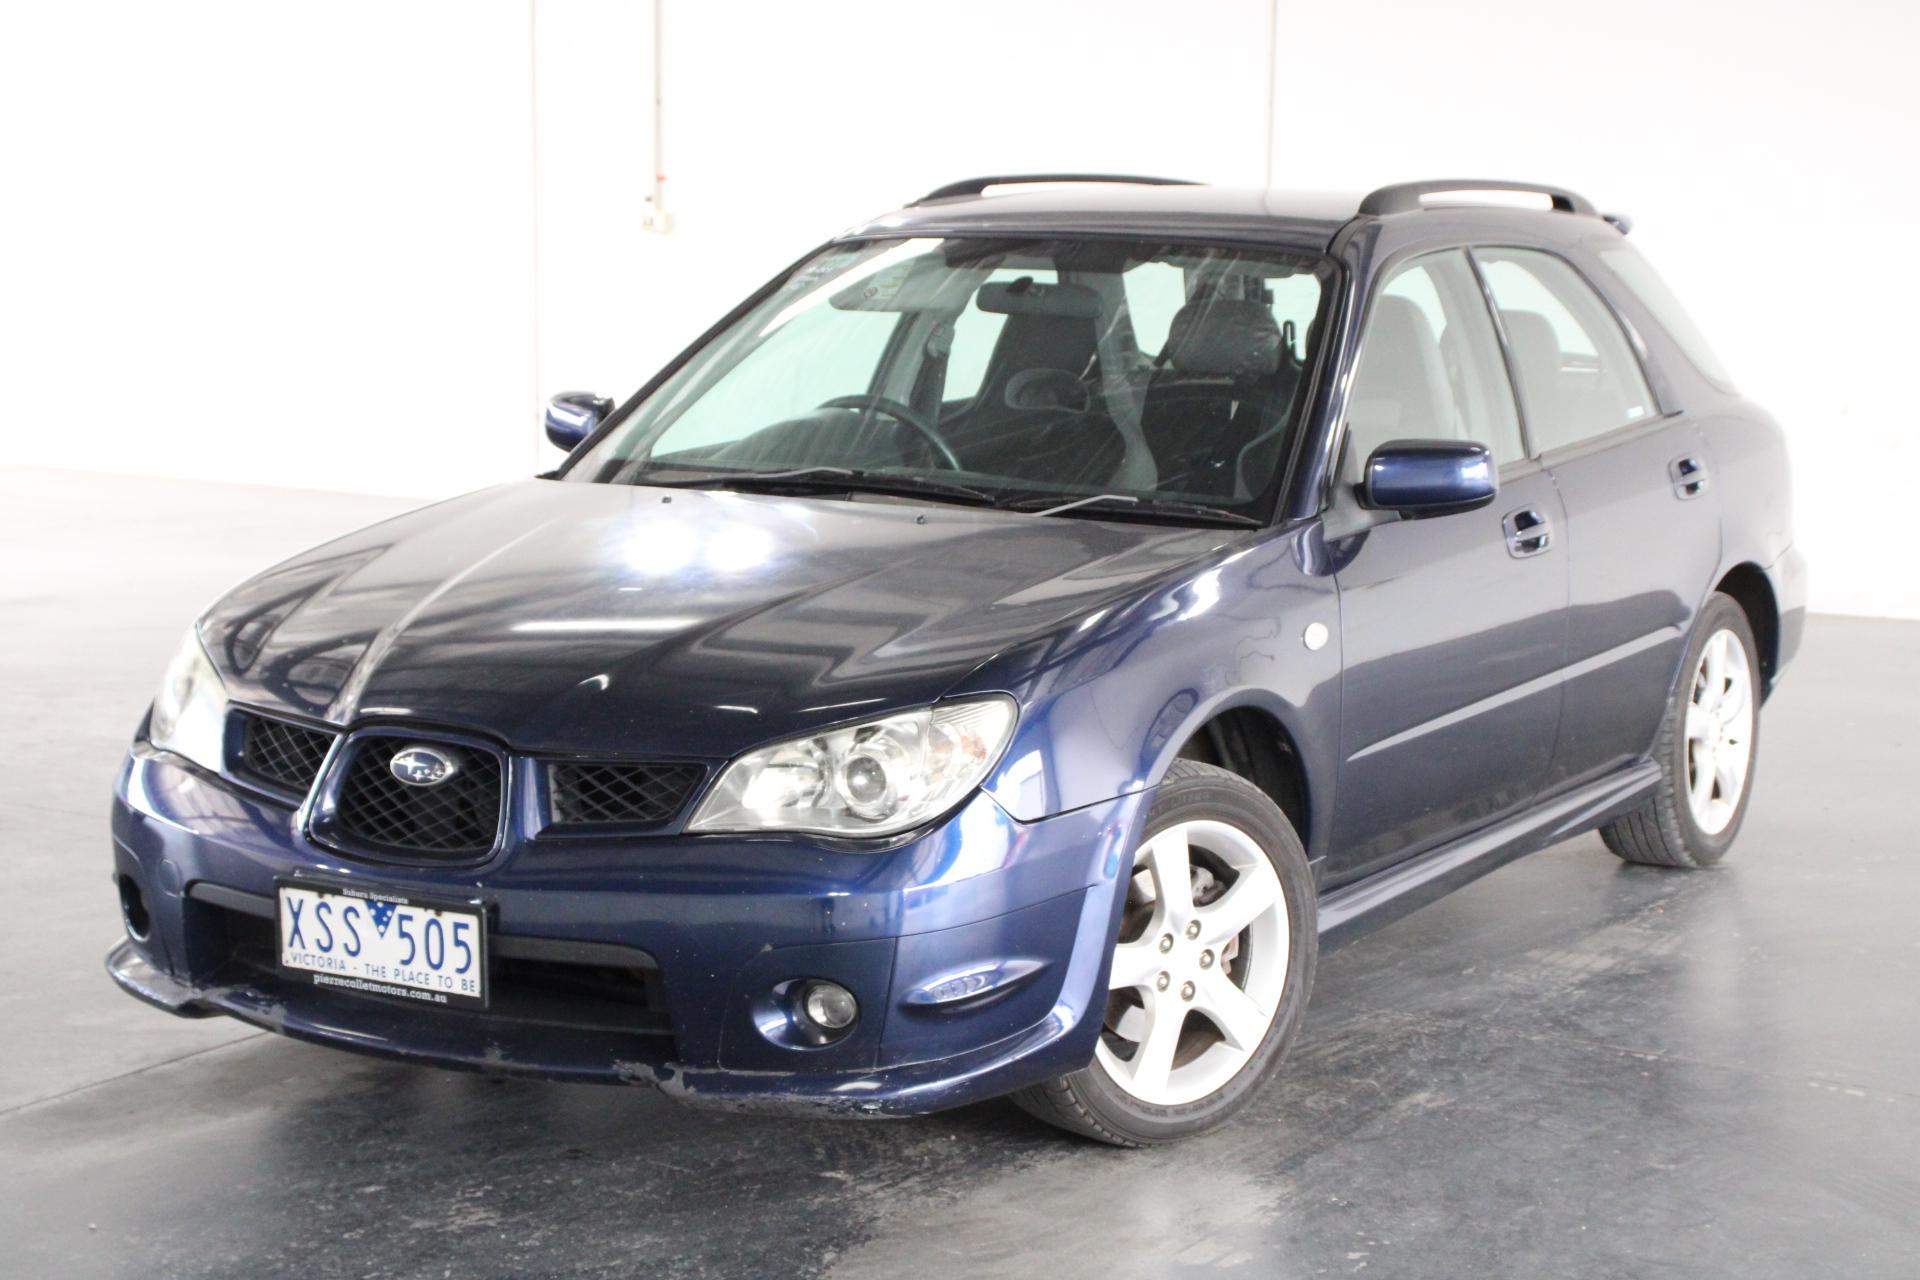 2006 Subaru Impreza 2.0R (AWD) G2 Automatic Hatchback